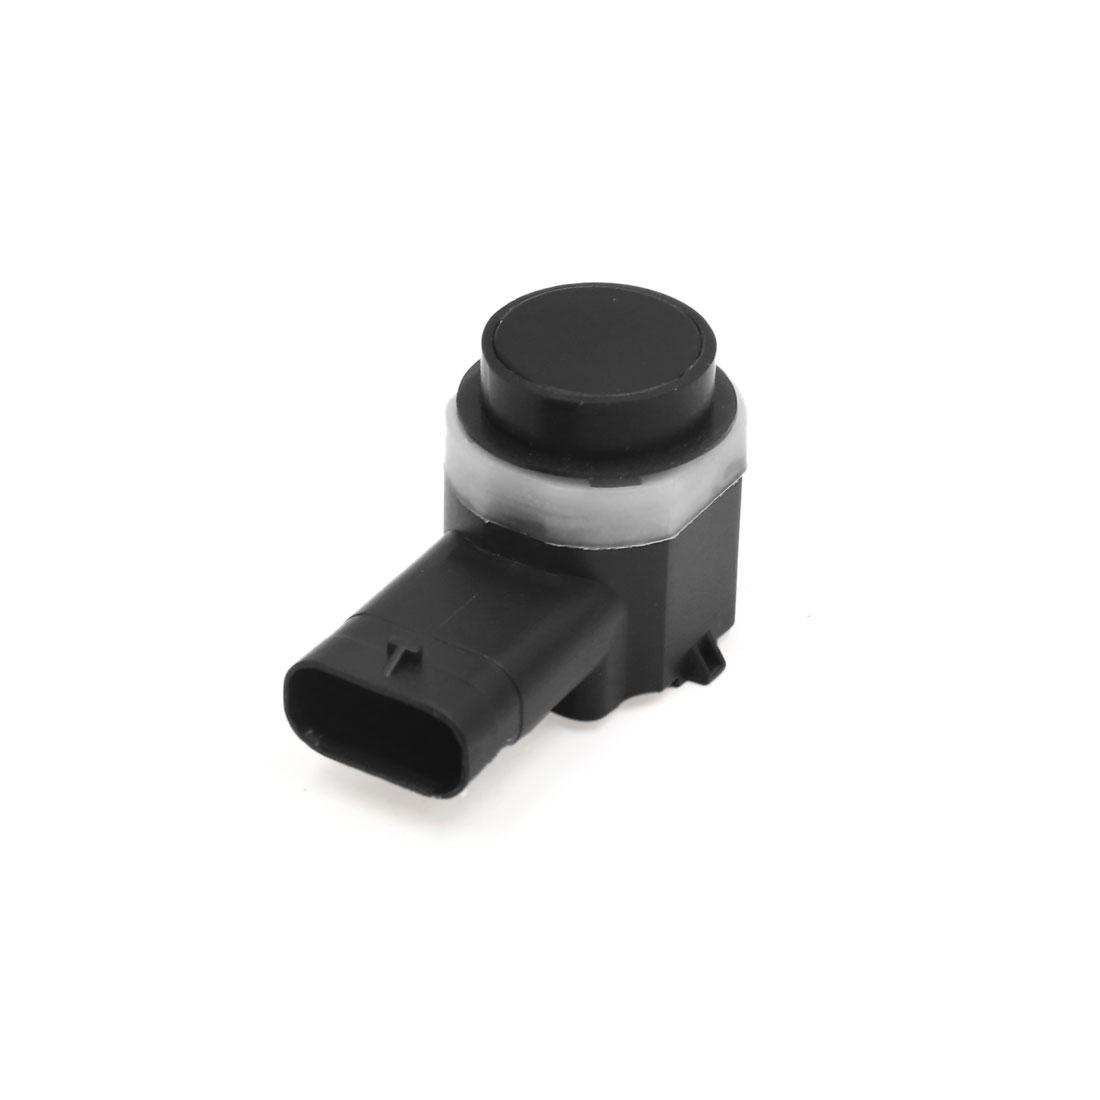 Bumper Parking Distance Reverse Sensor 30786968 for VOLVO S60 S80 V70 C30 C70